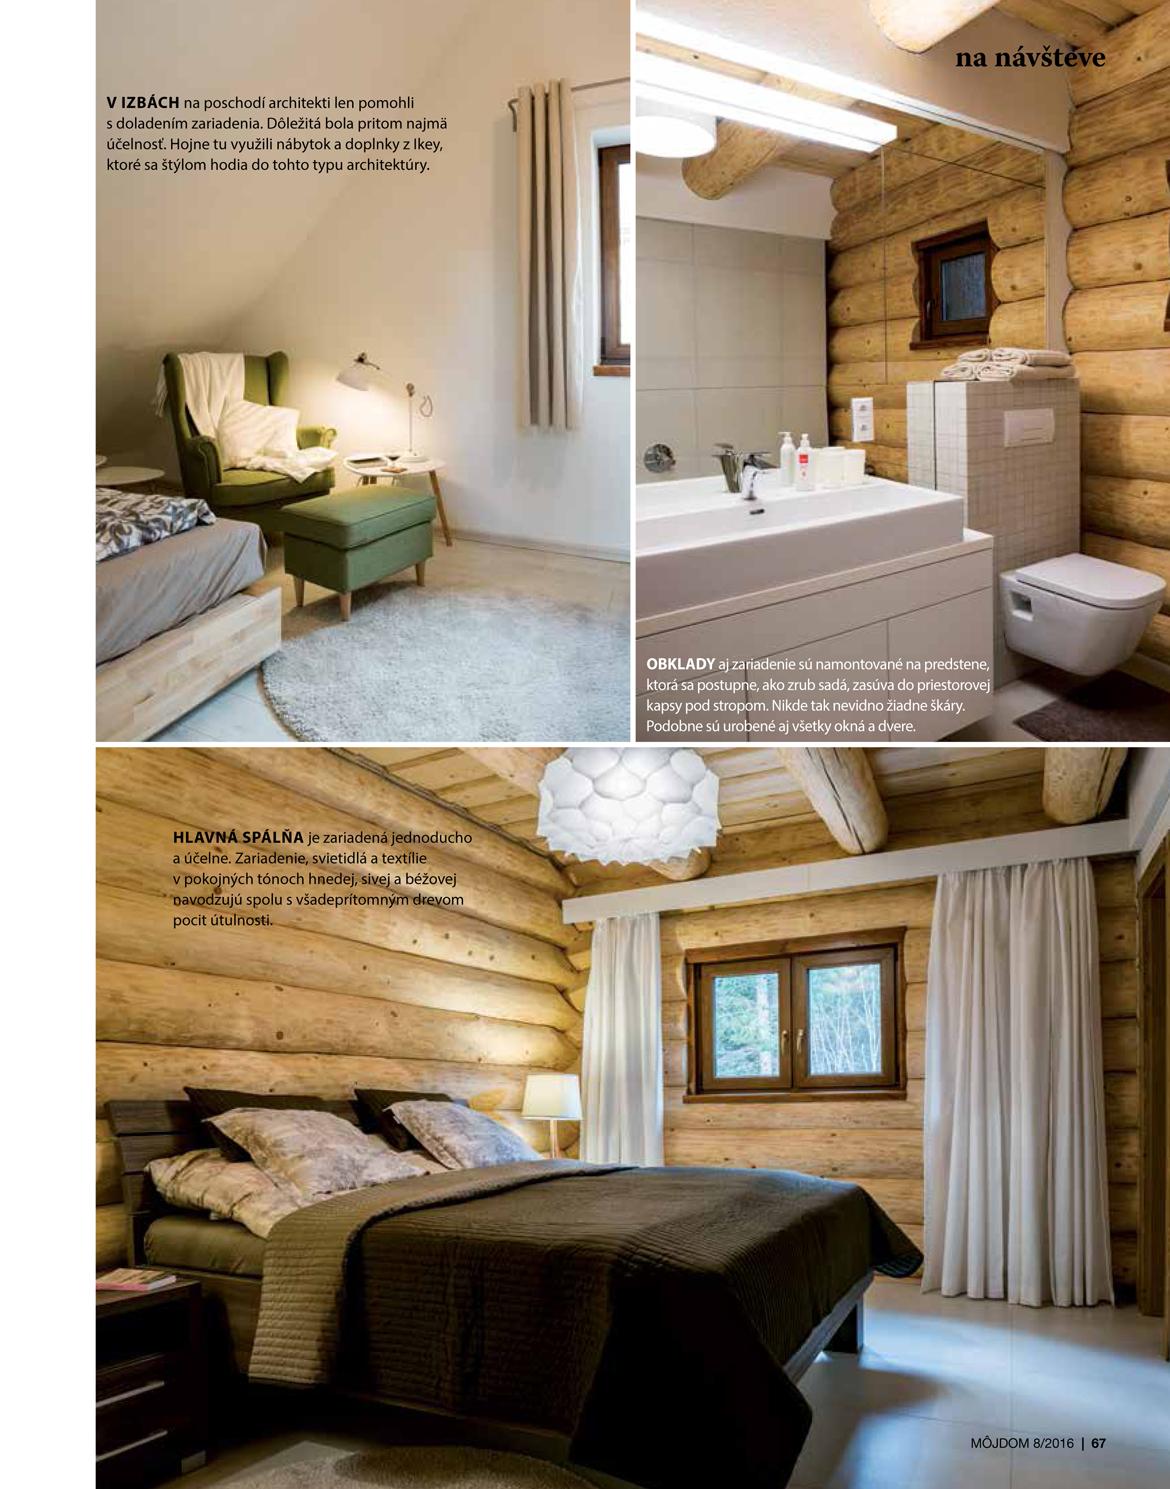 012-interier-zrub-tale-mojdom-pavlech-architekti